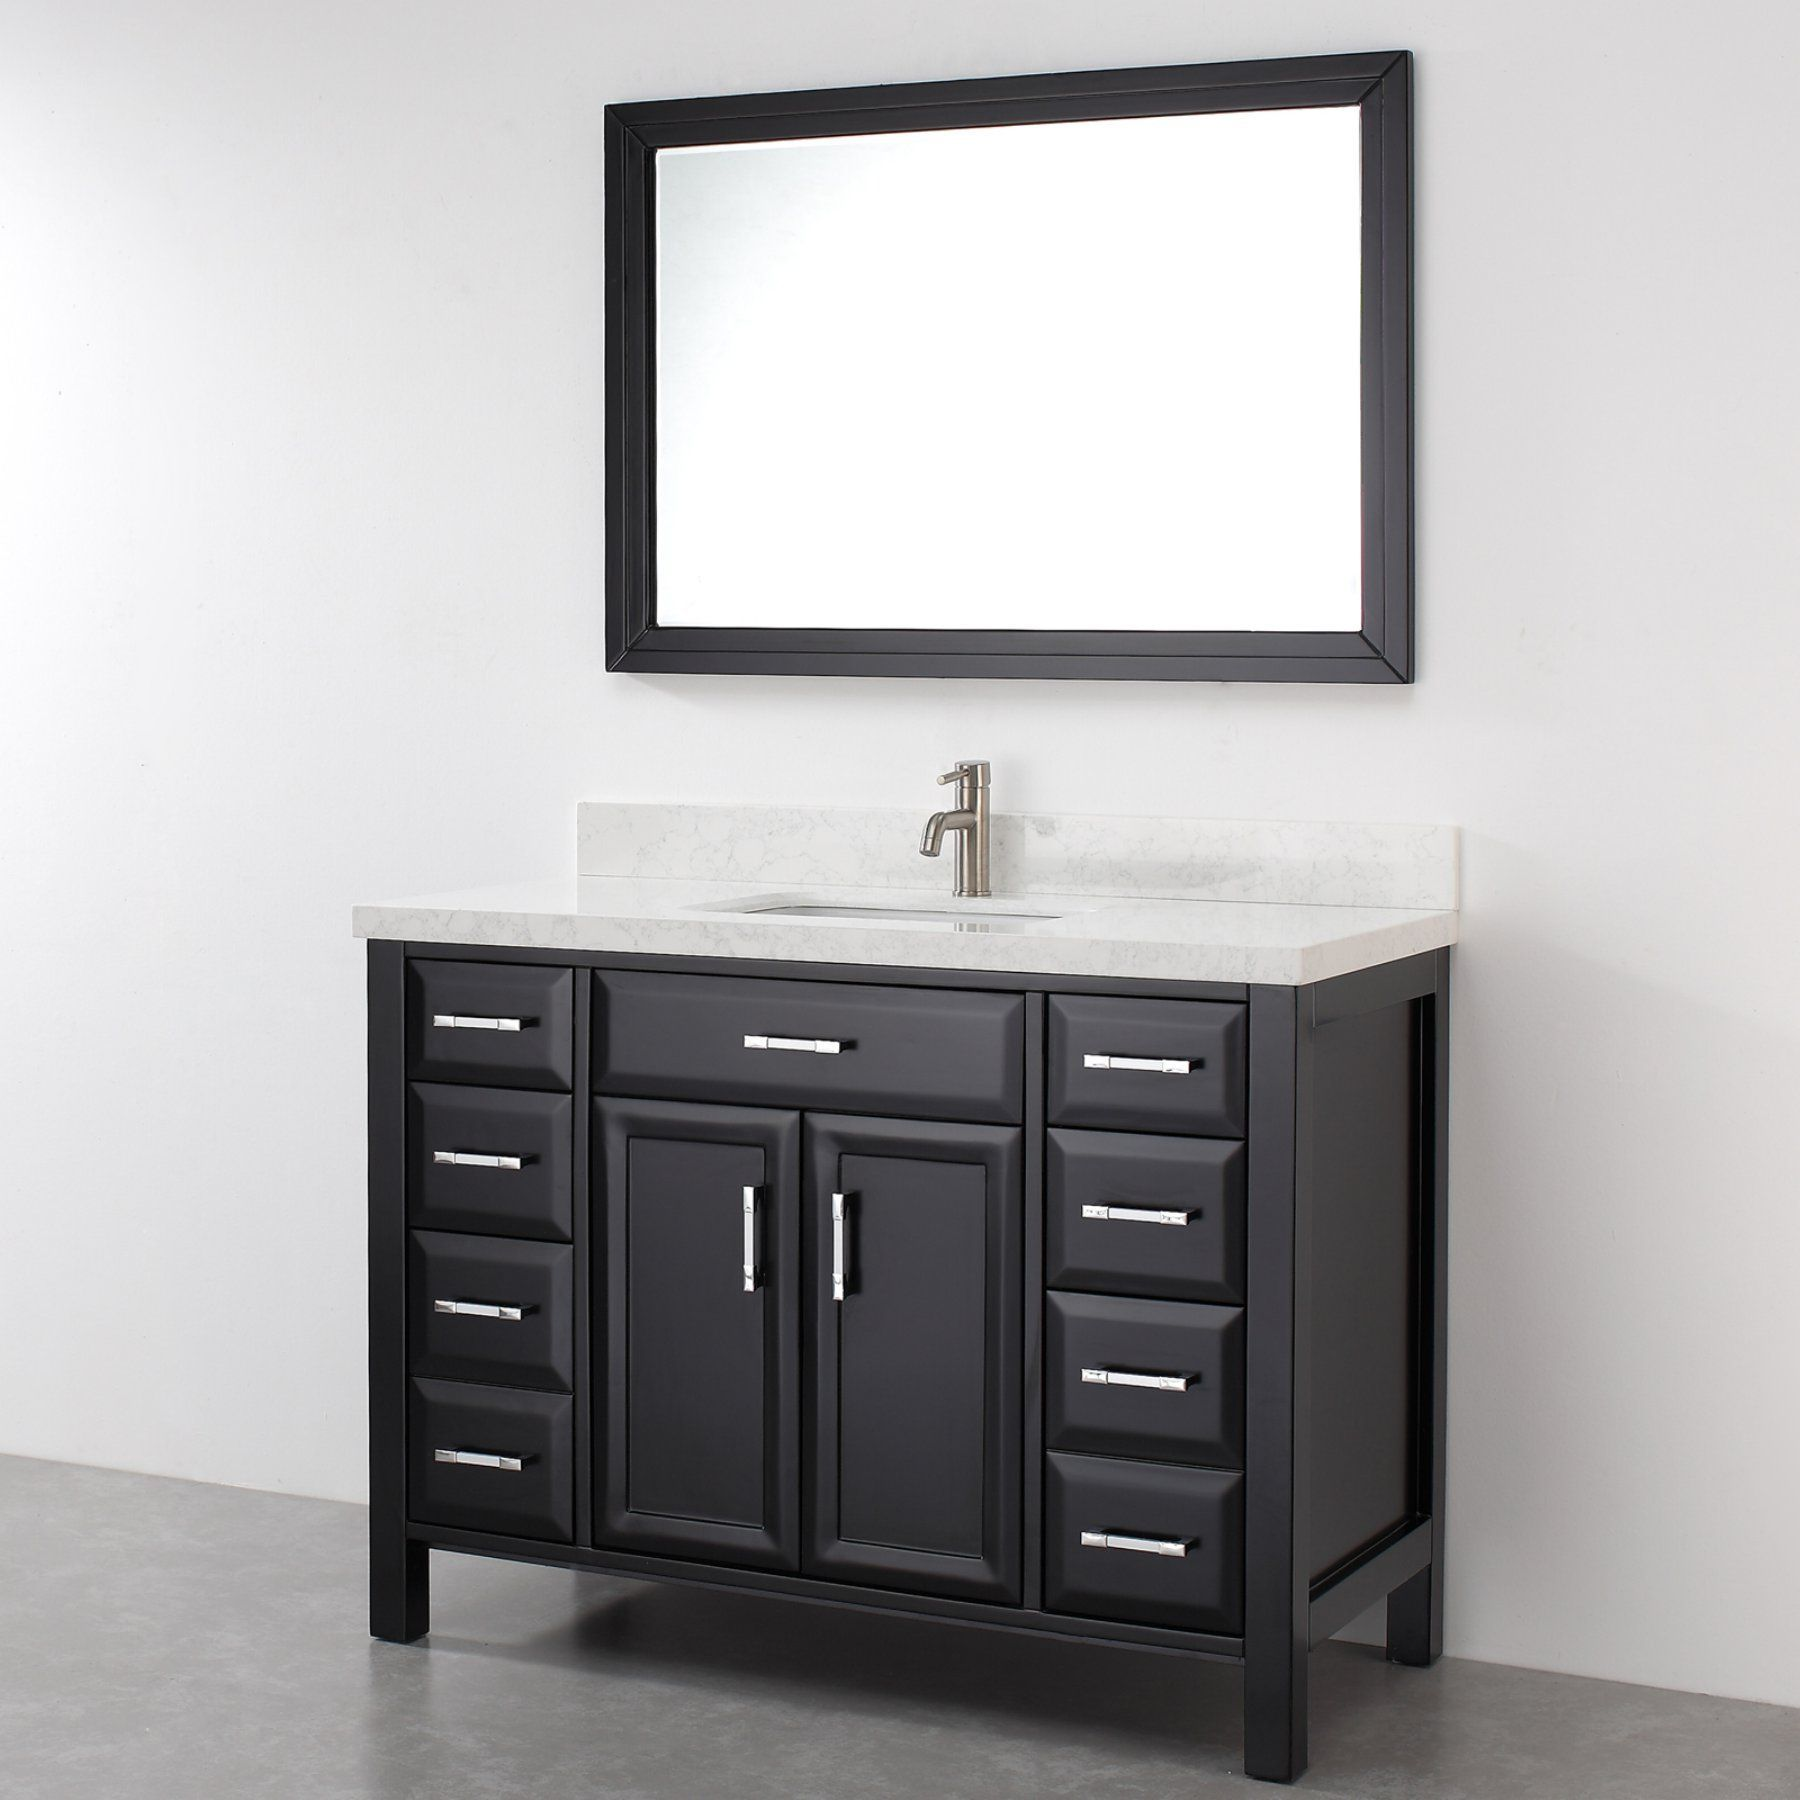 Bauhaus Bath Caledonia 48 In Single Bathroom Vanity Set With